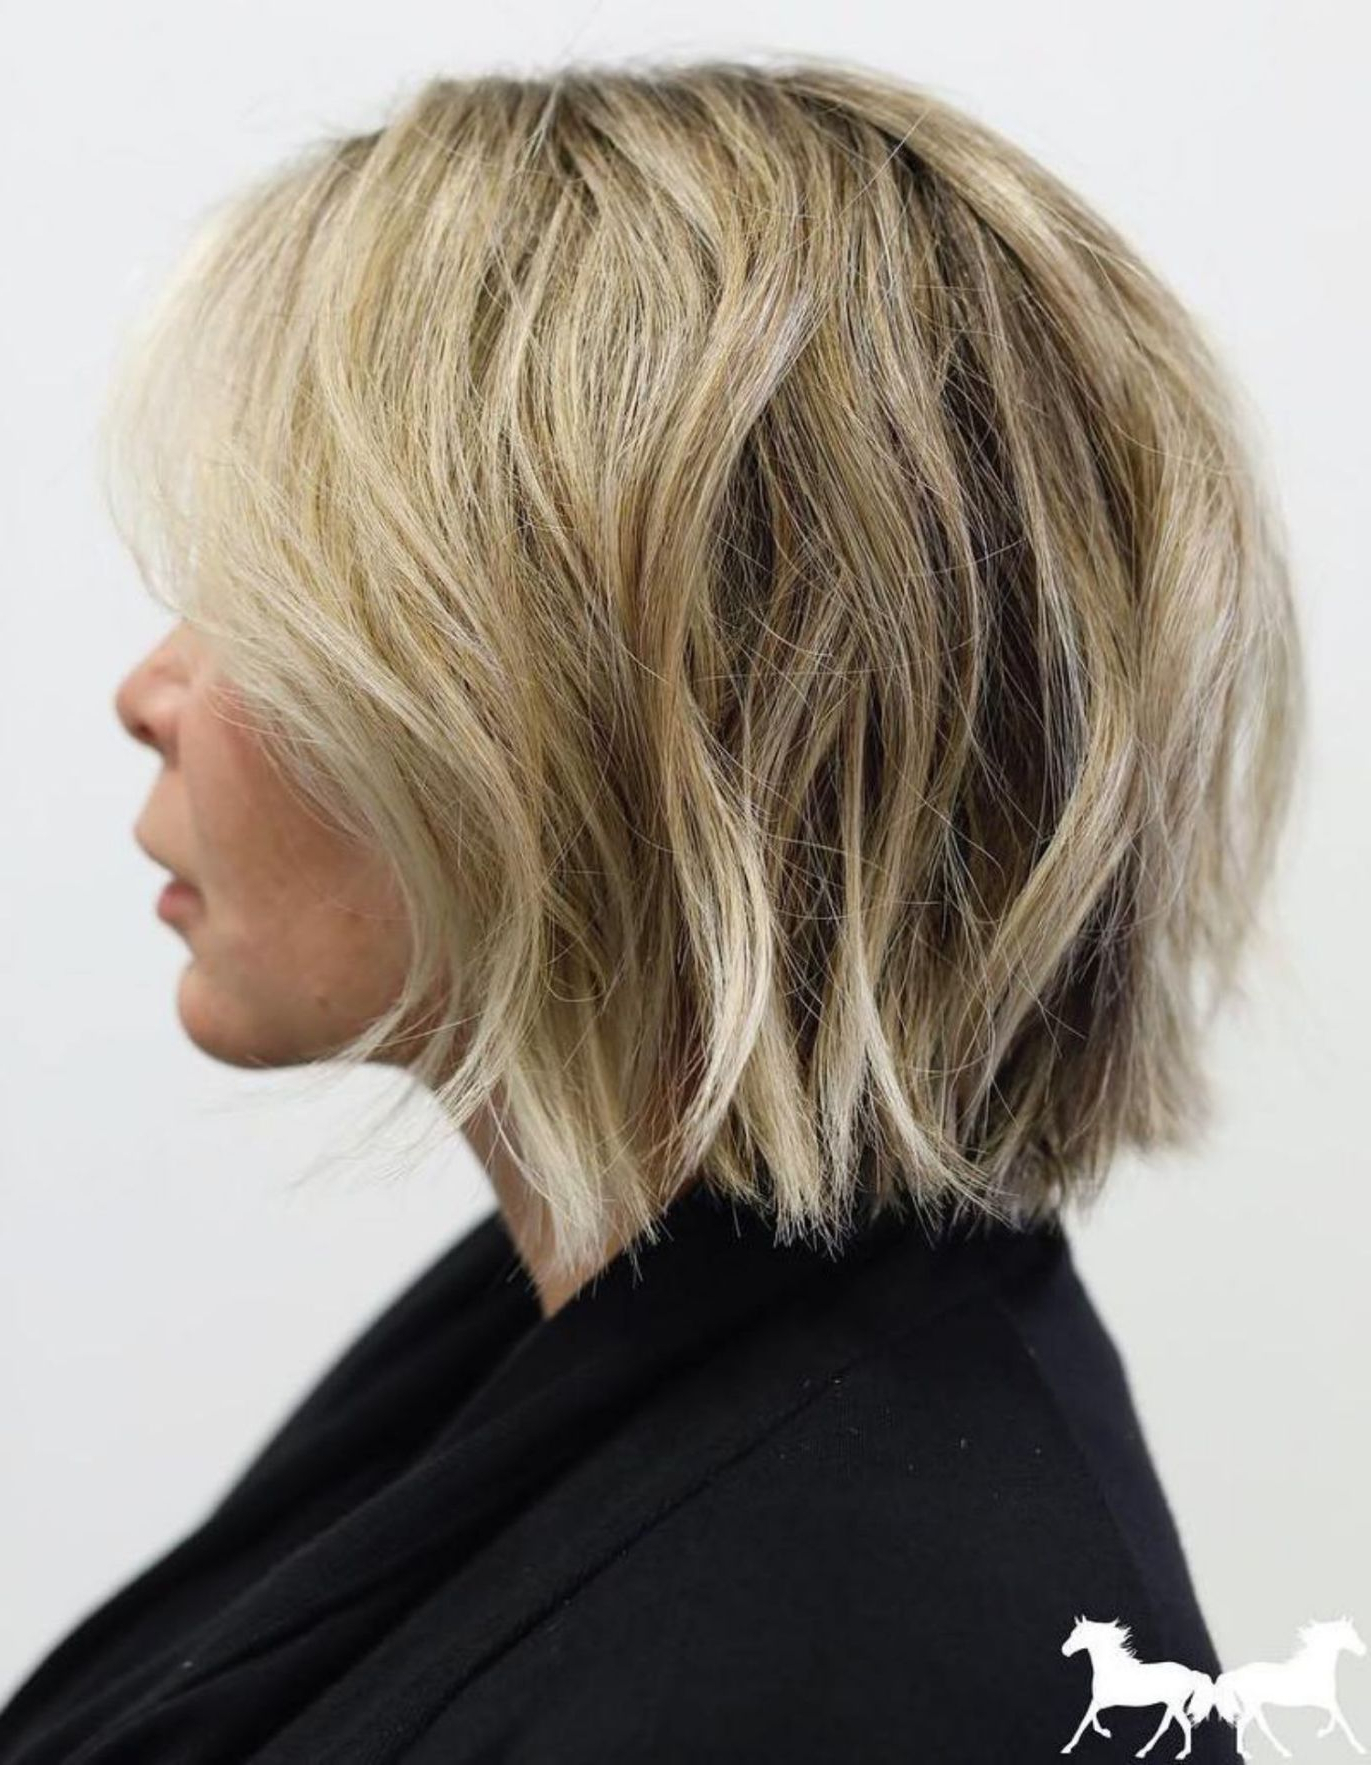 70 Fabulous Choppy Bob Hairstyles | Hair | Pinterest | Choppy Bob Within Tousled Wavy Blonde Bob Hairstyles (View 19 of 25)